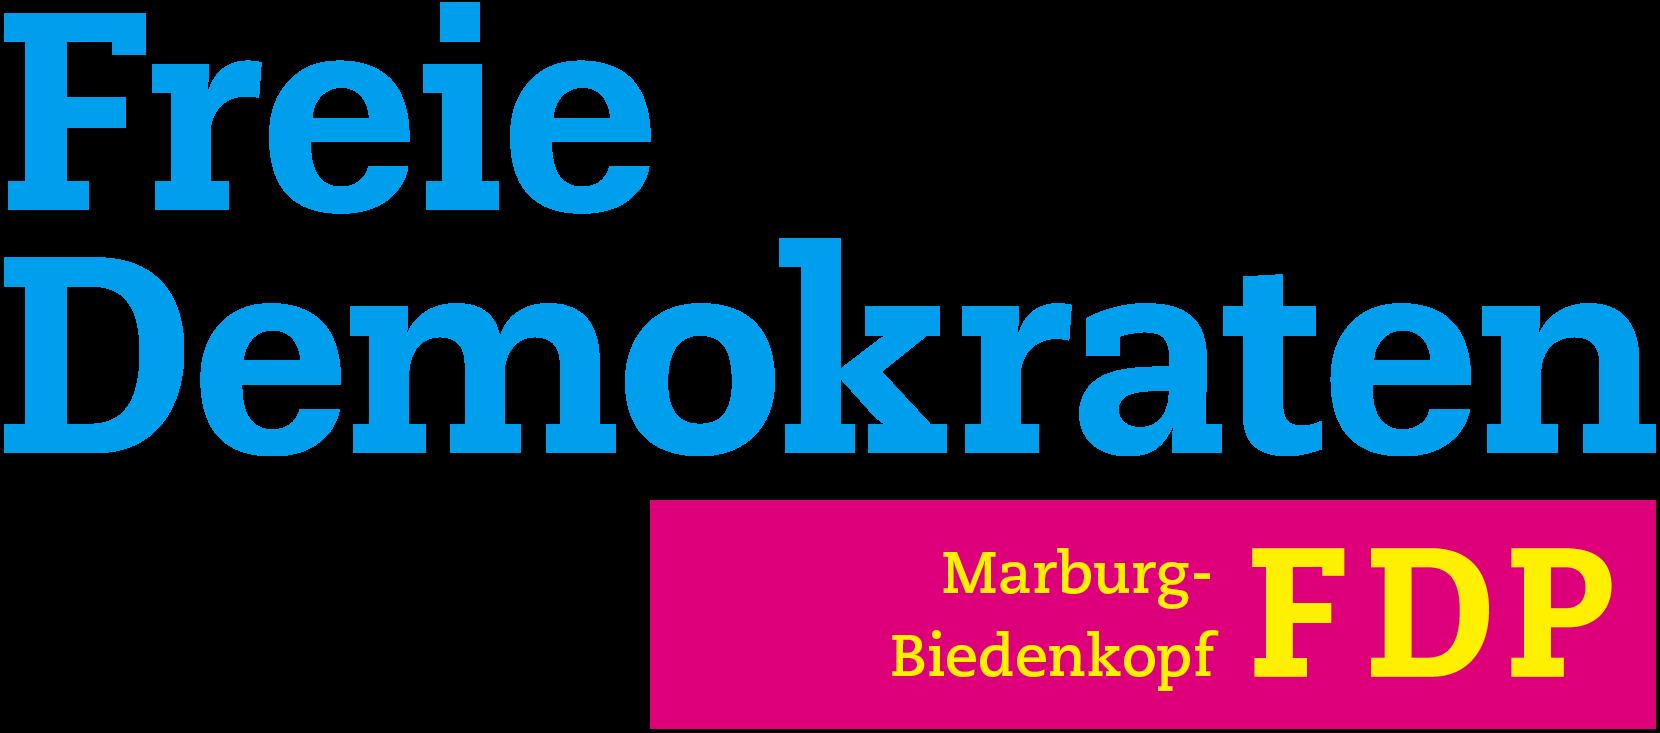 FDP Marburg-Biedenkopf